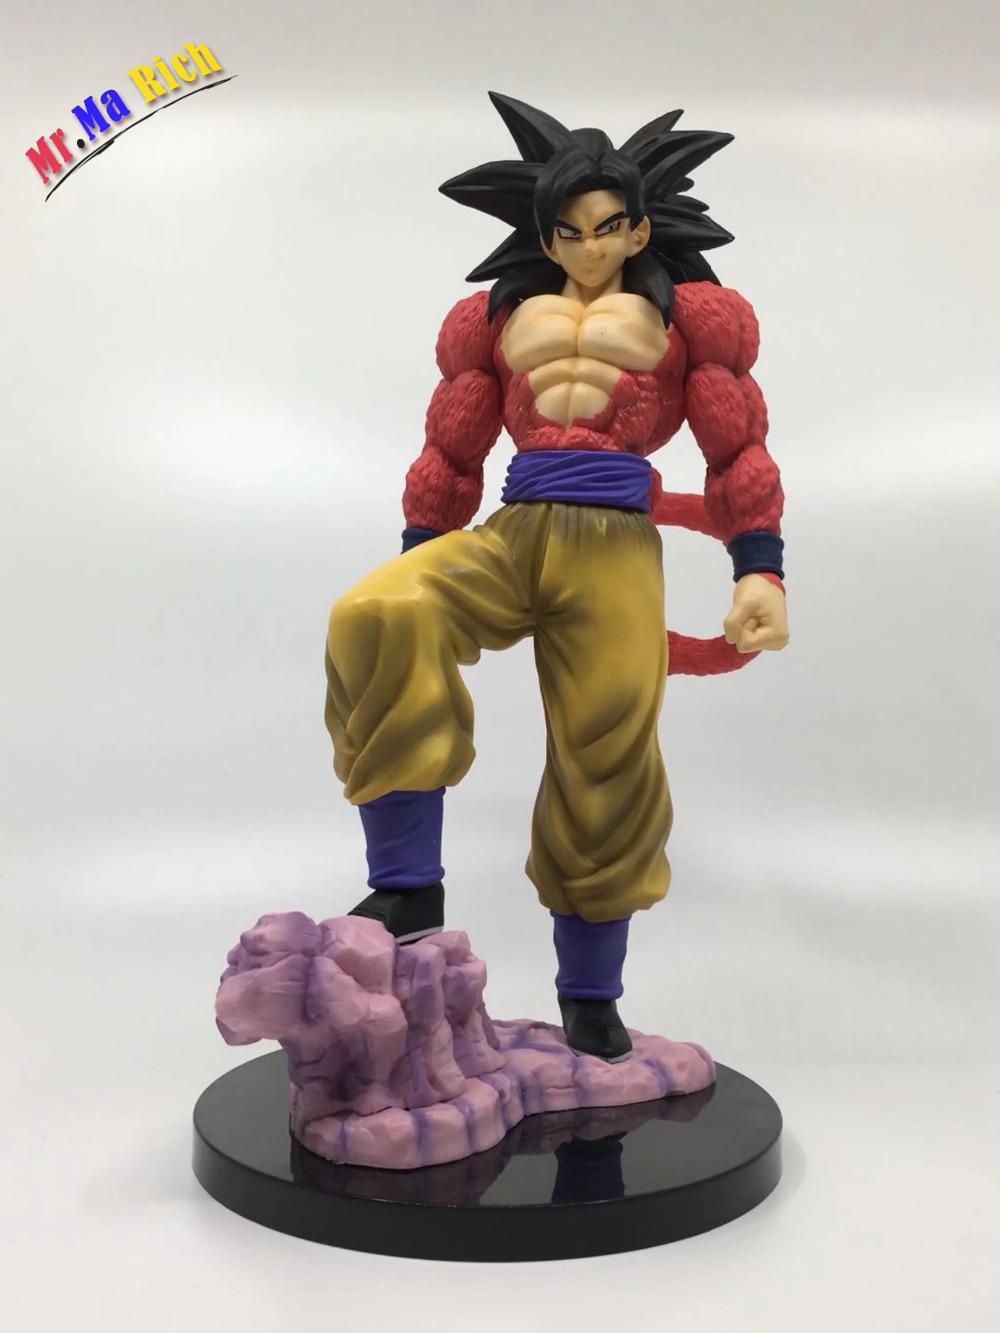 Figurine Anime boule 26 cm Super Saiyan 4 fils Goku Pvc Figure de collection modèle jouet cadeau avec boîte